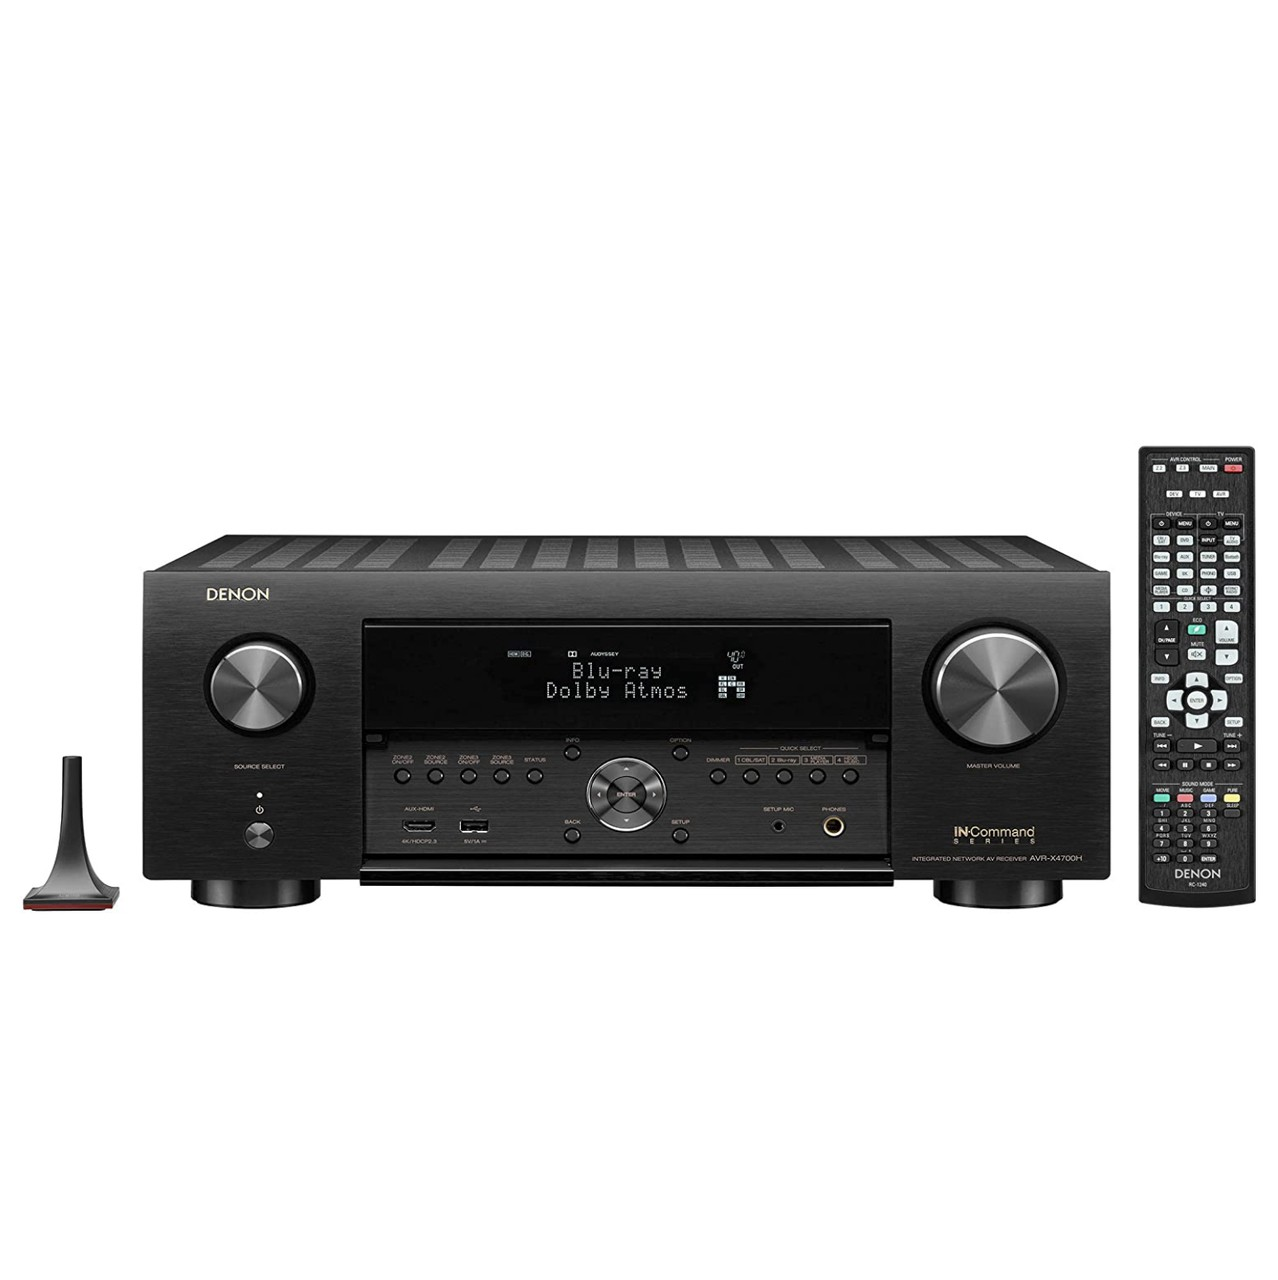 Receiver Denon AVR-X4700H ( Modelo 2020 ) 8K 9.2 Canais Bluetooth Wifi Dolby Atmos Heos Wireless HDR HDMI 110V